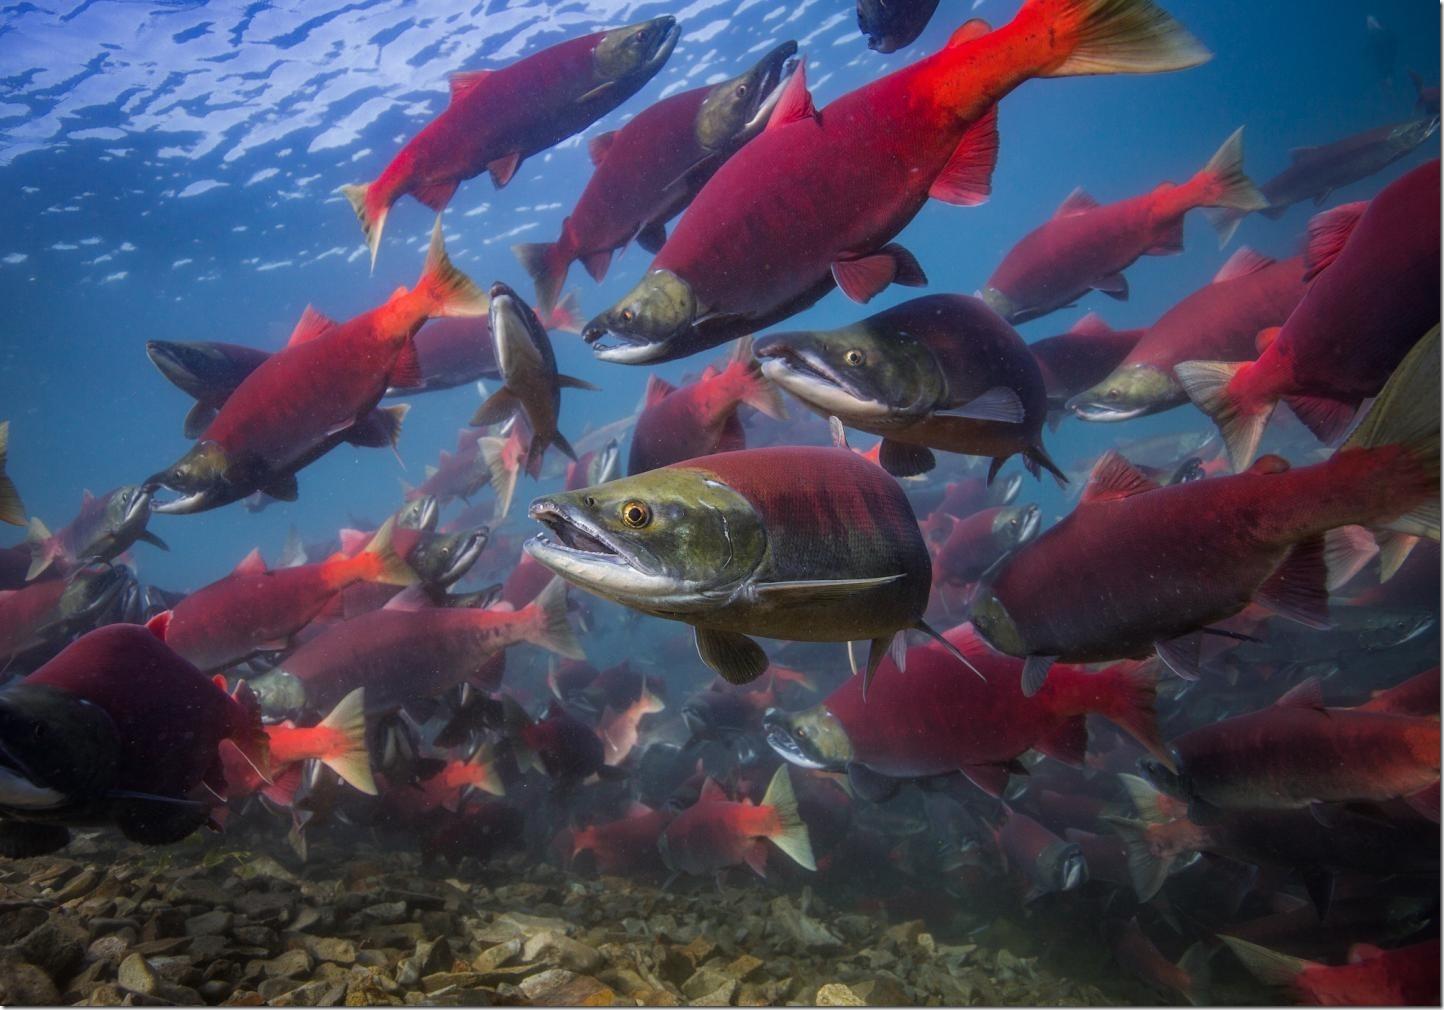 Adult sockeye salmon returning to spawn in the lakes of Bristol Bay, Alaska. Credit: Jason Ching/University of Washington